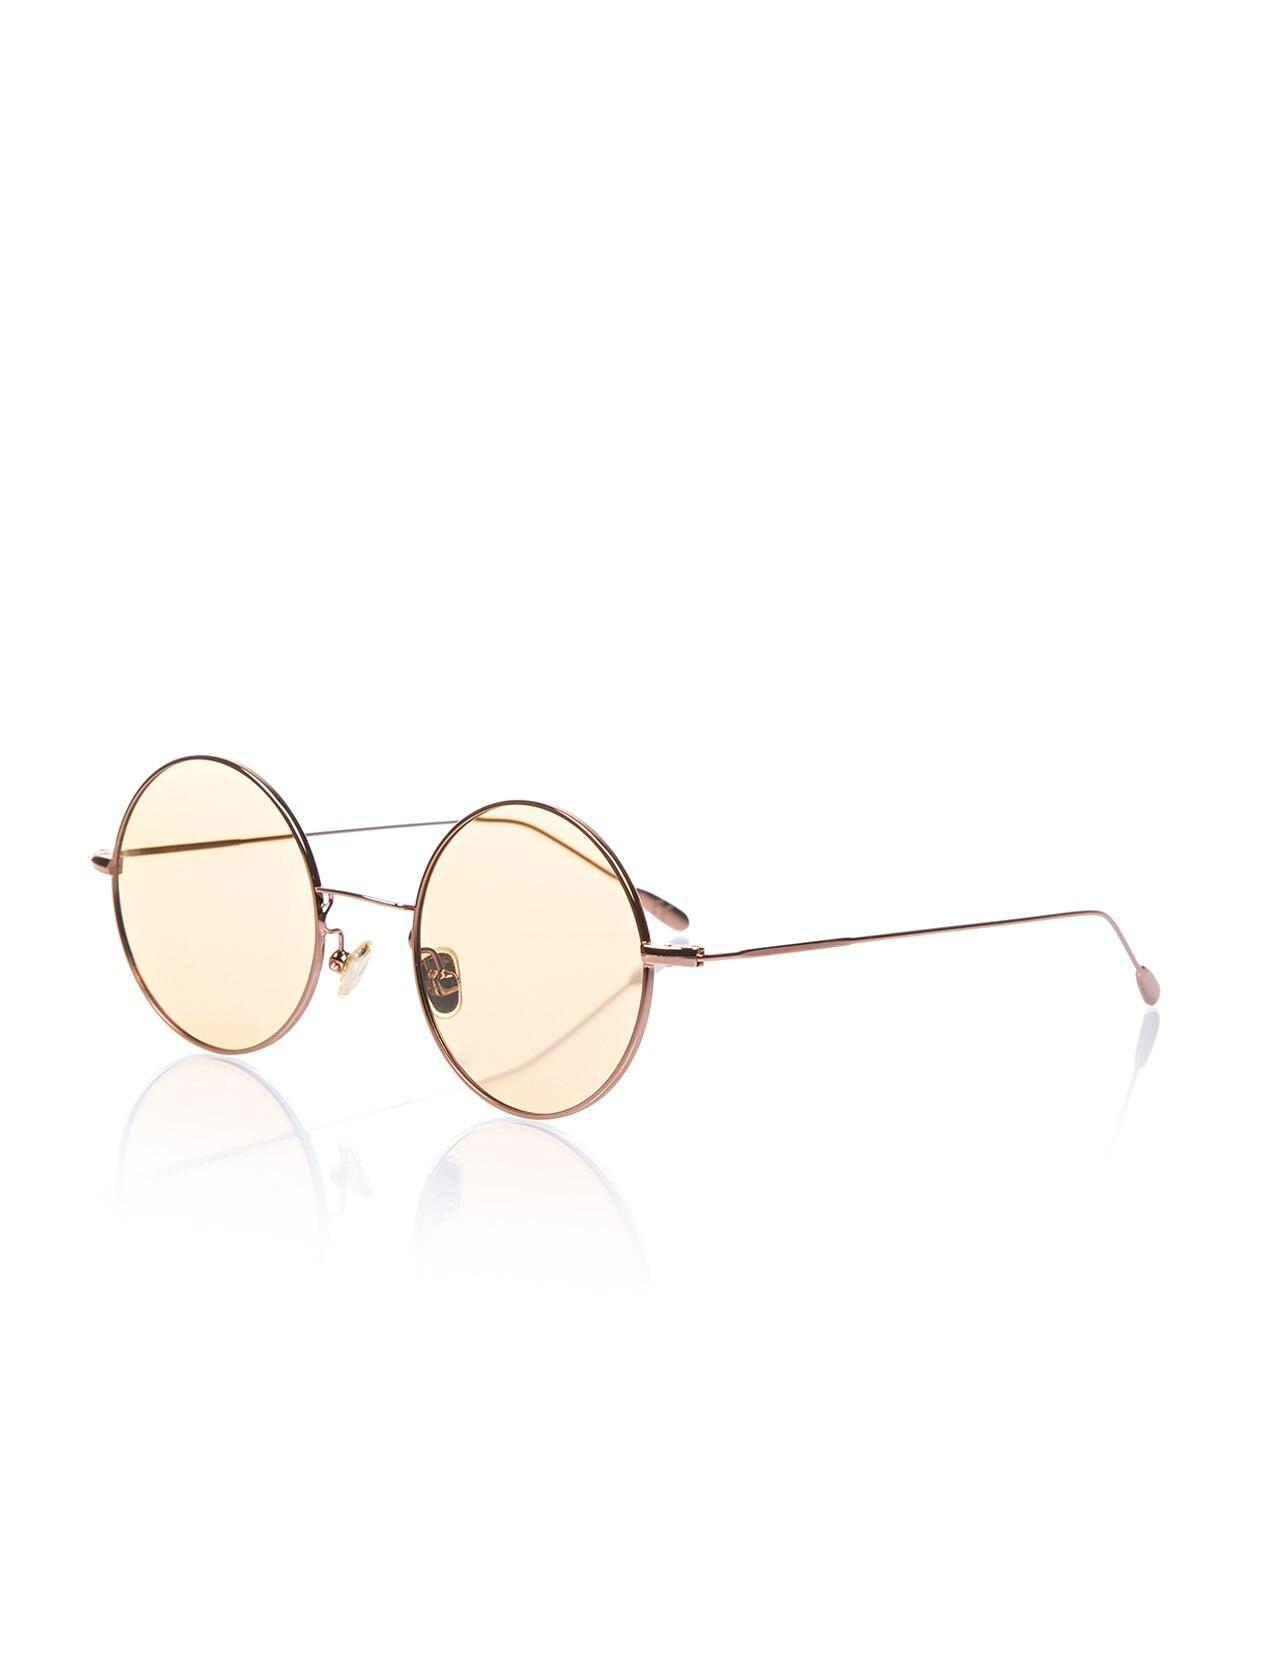 Unisex sunglasses opc 17014 06 metal yellow organic round round 50-22-145 optoline club